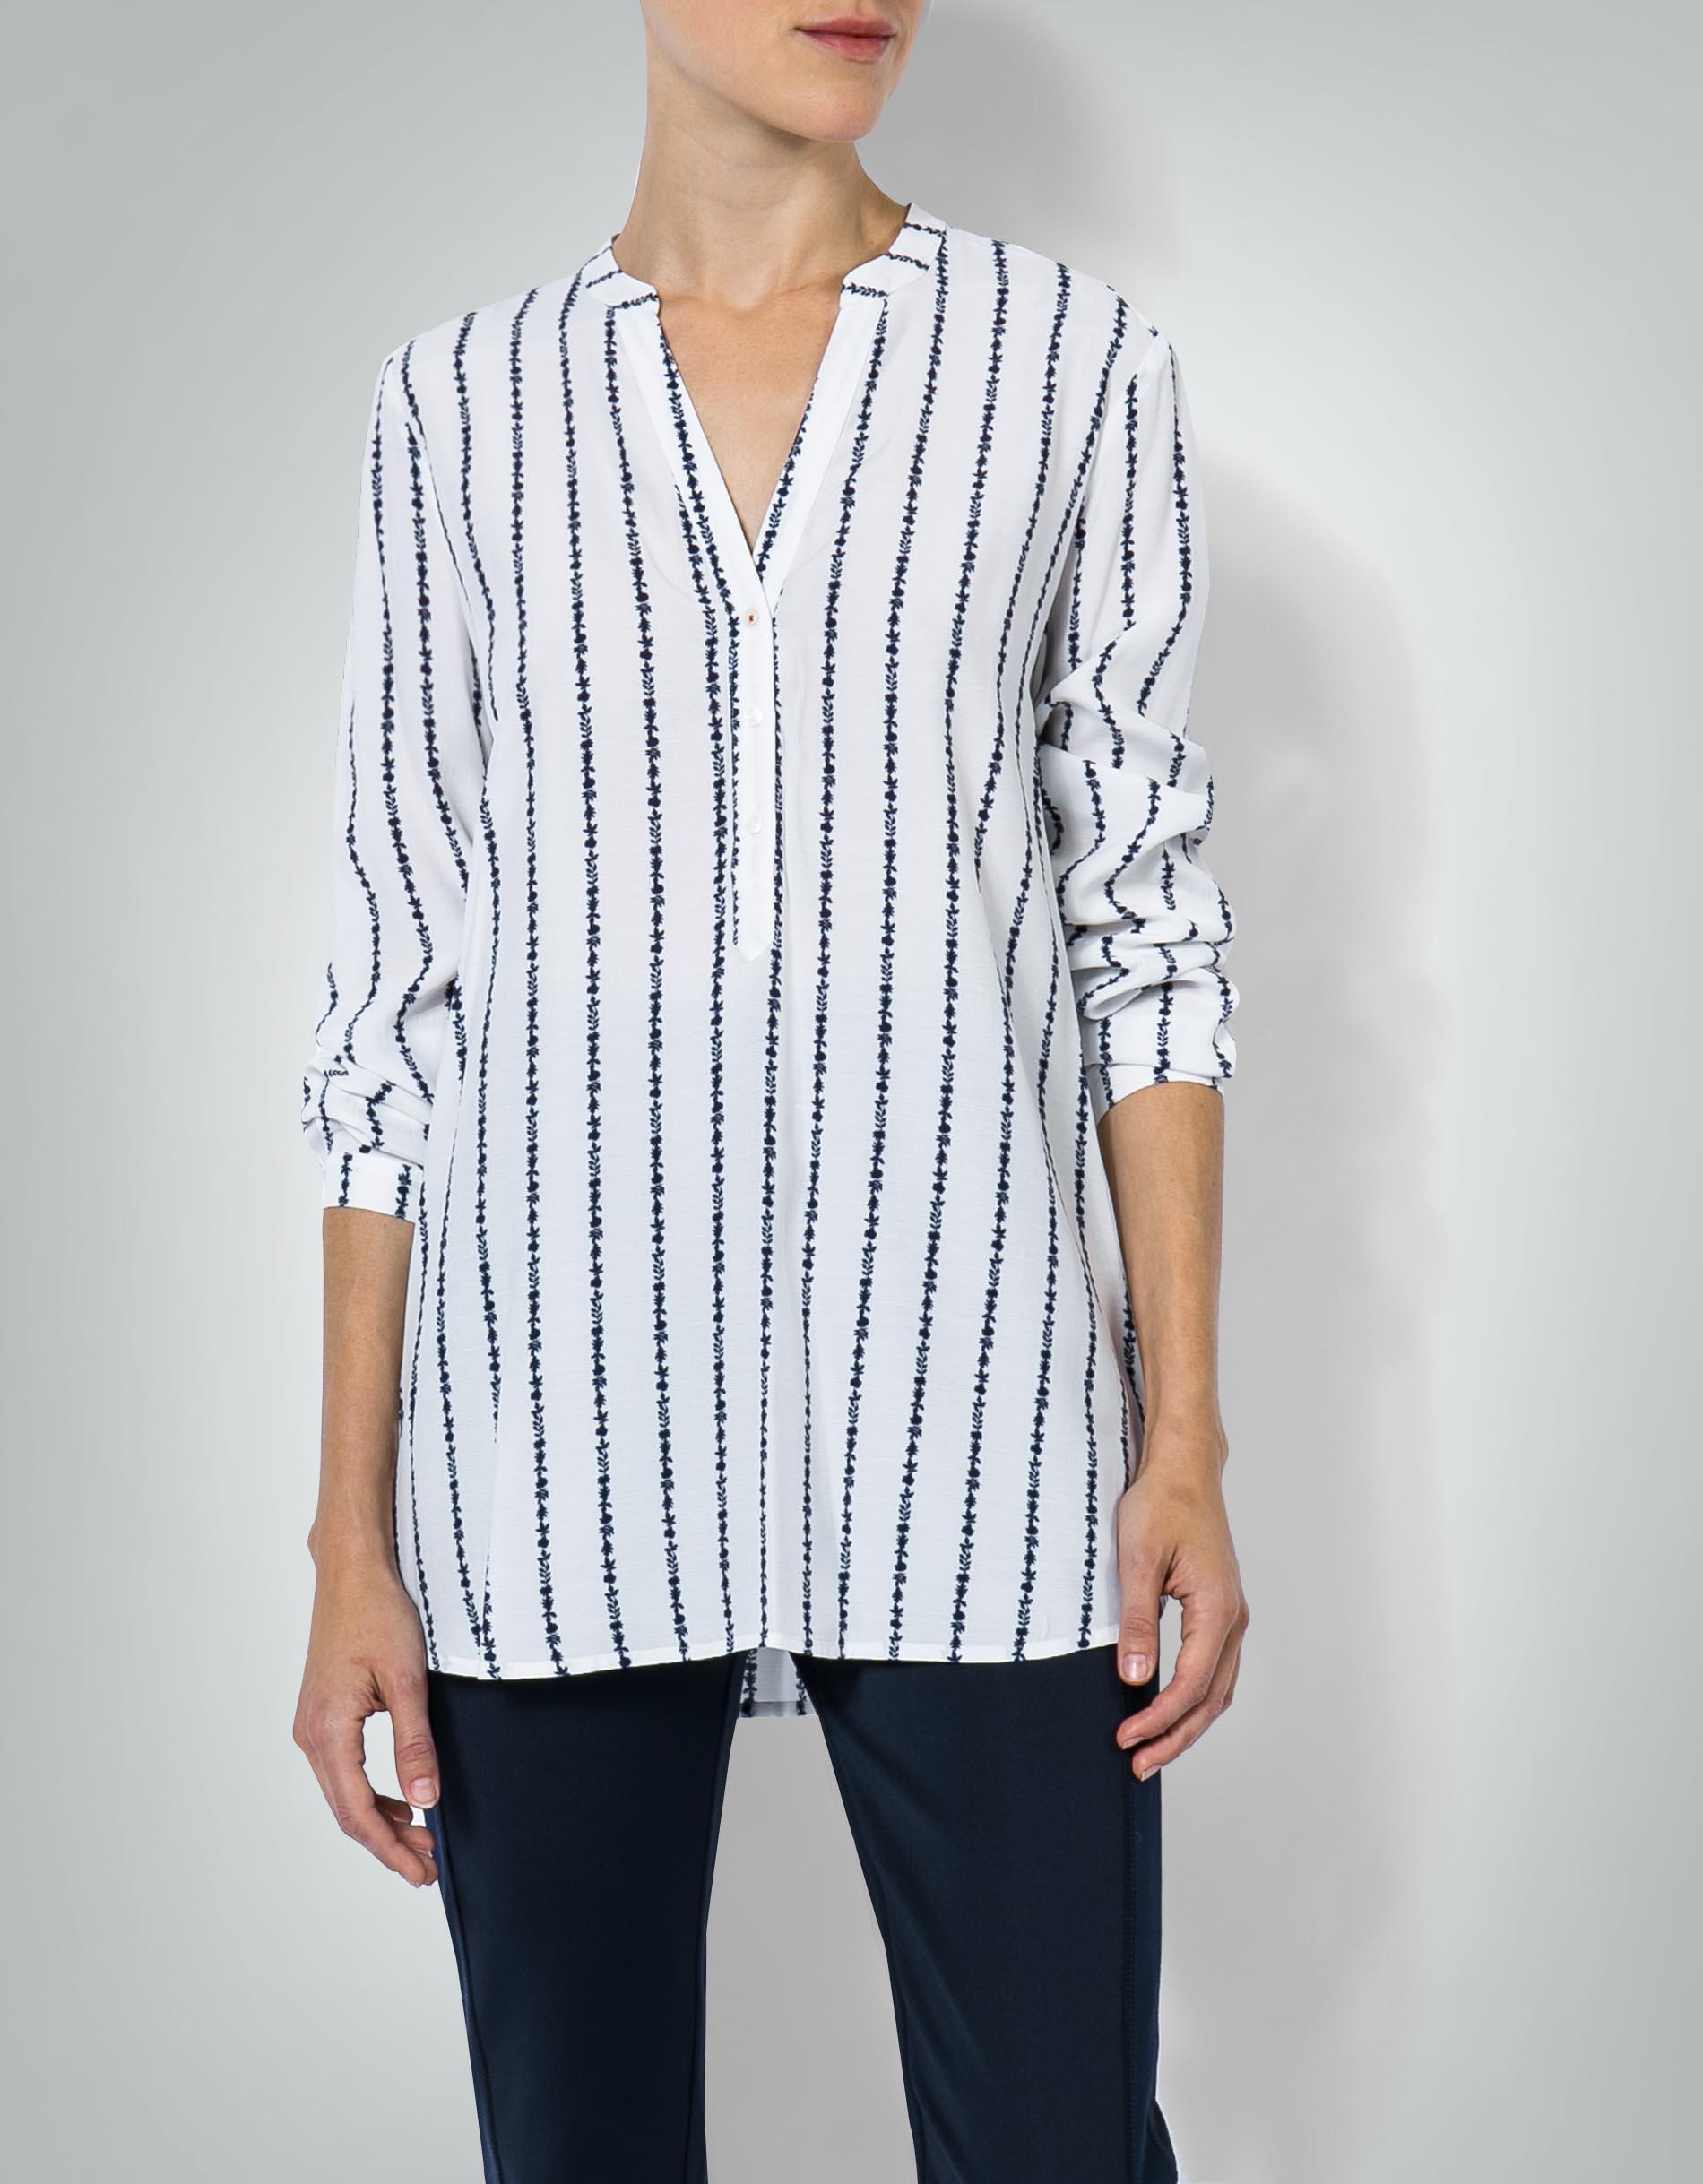 tommy hilfiger damen bluse tunika mit streifenmuster. Black Bedroom Furniture Sets. Home Design Ideas